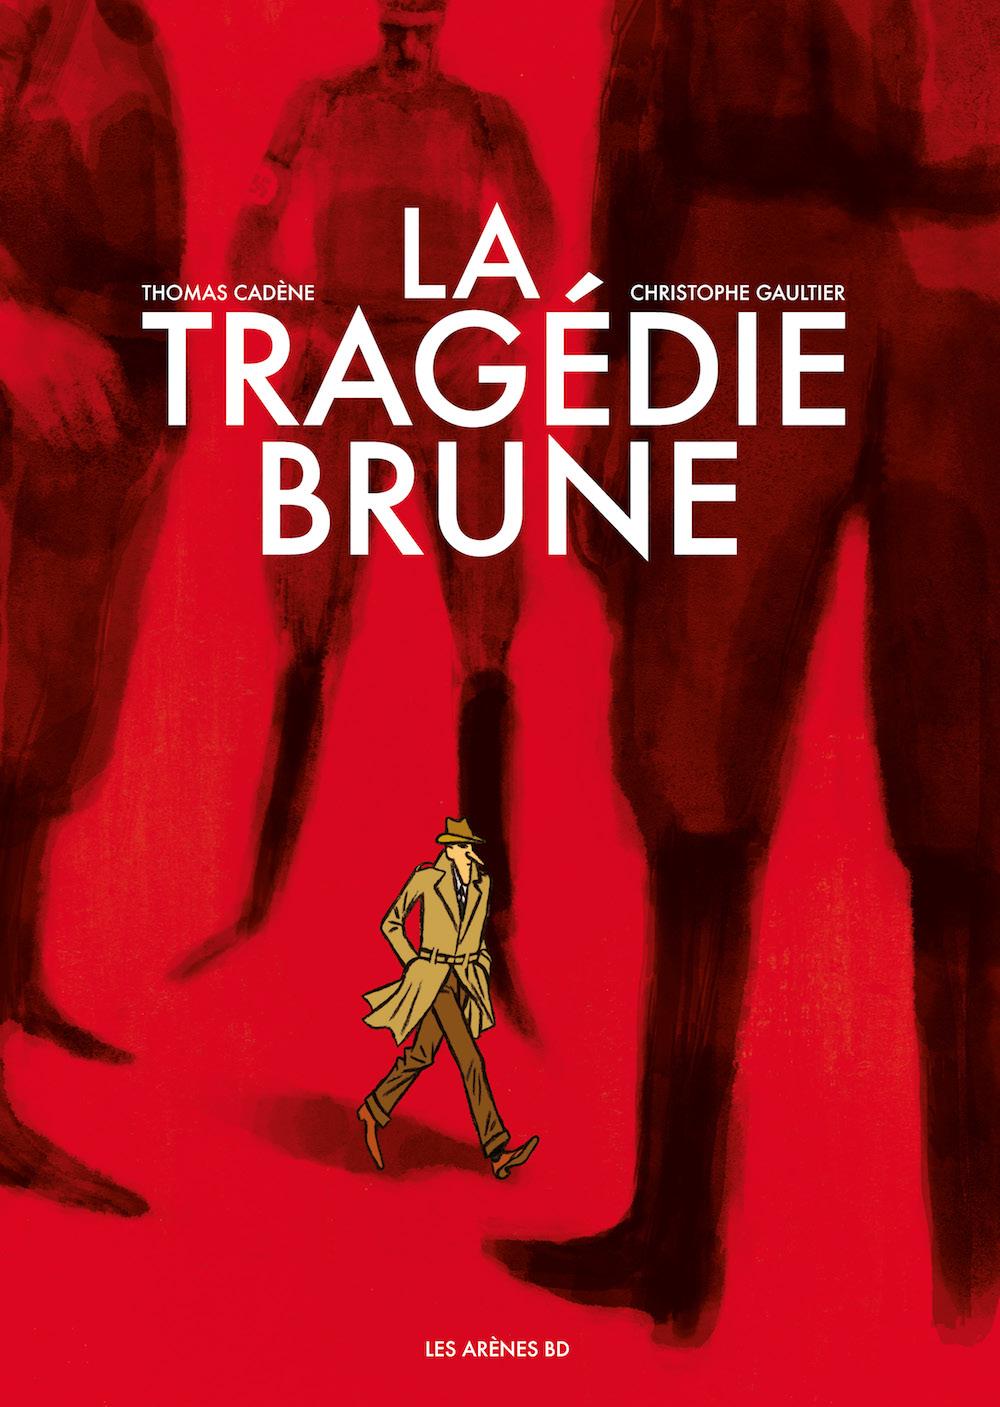 LaTragédieBrune_plat1